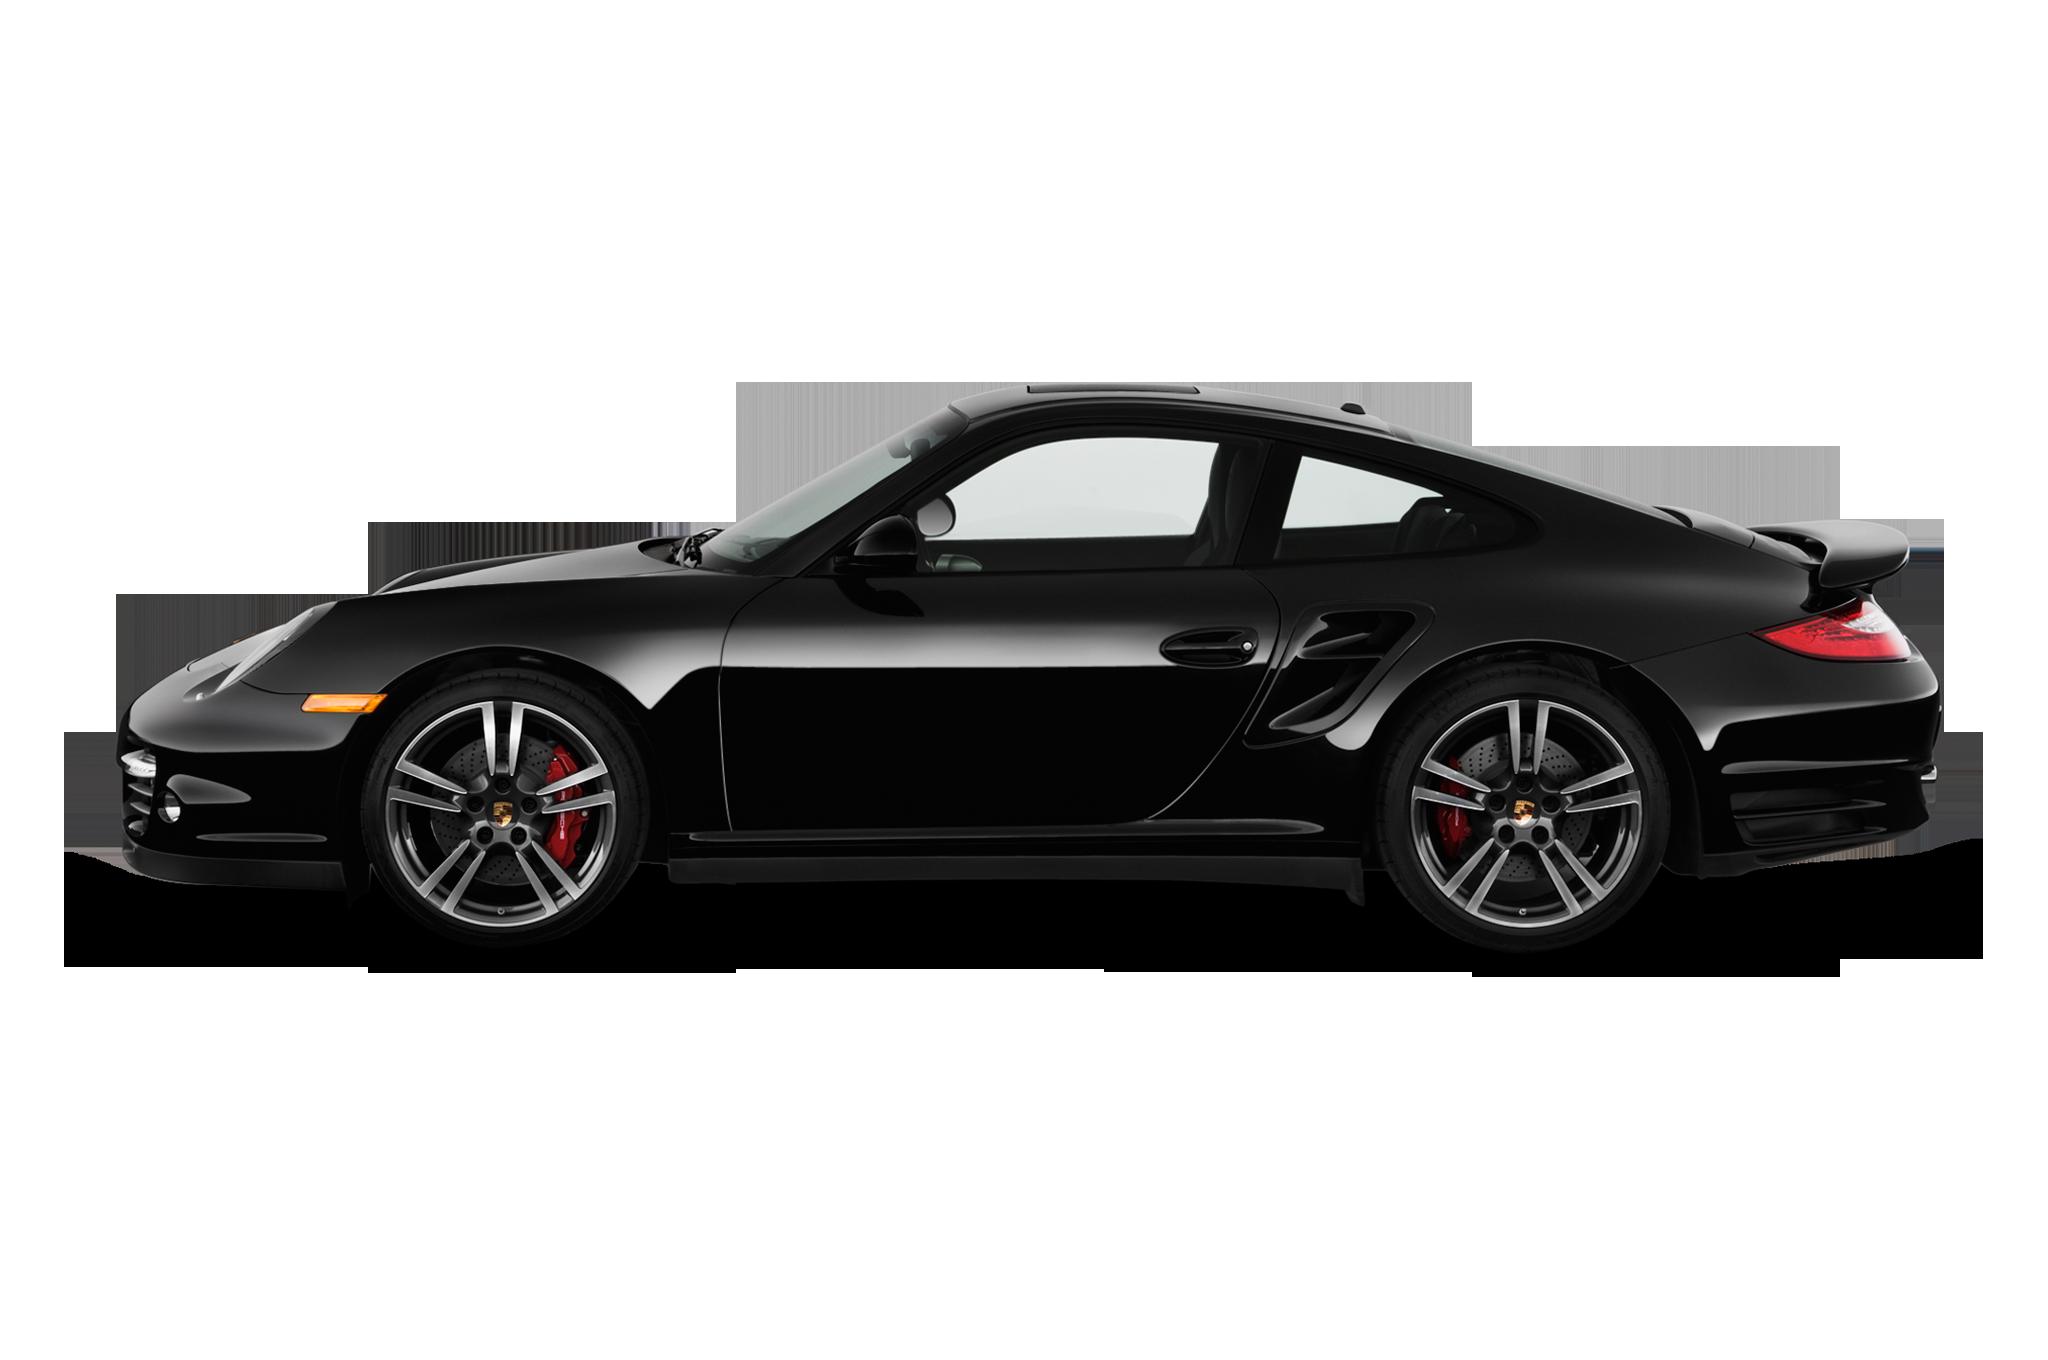 2010-porsche-911-carrera-turbo-coupe-side-view Exciting Porsche 911 Gt2 La Centrale Cars Trend